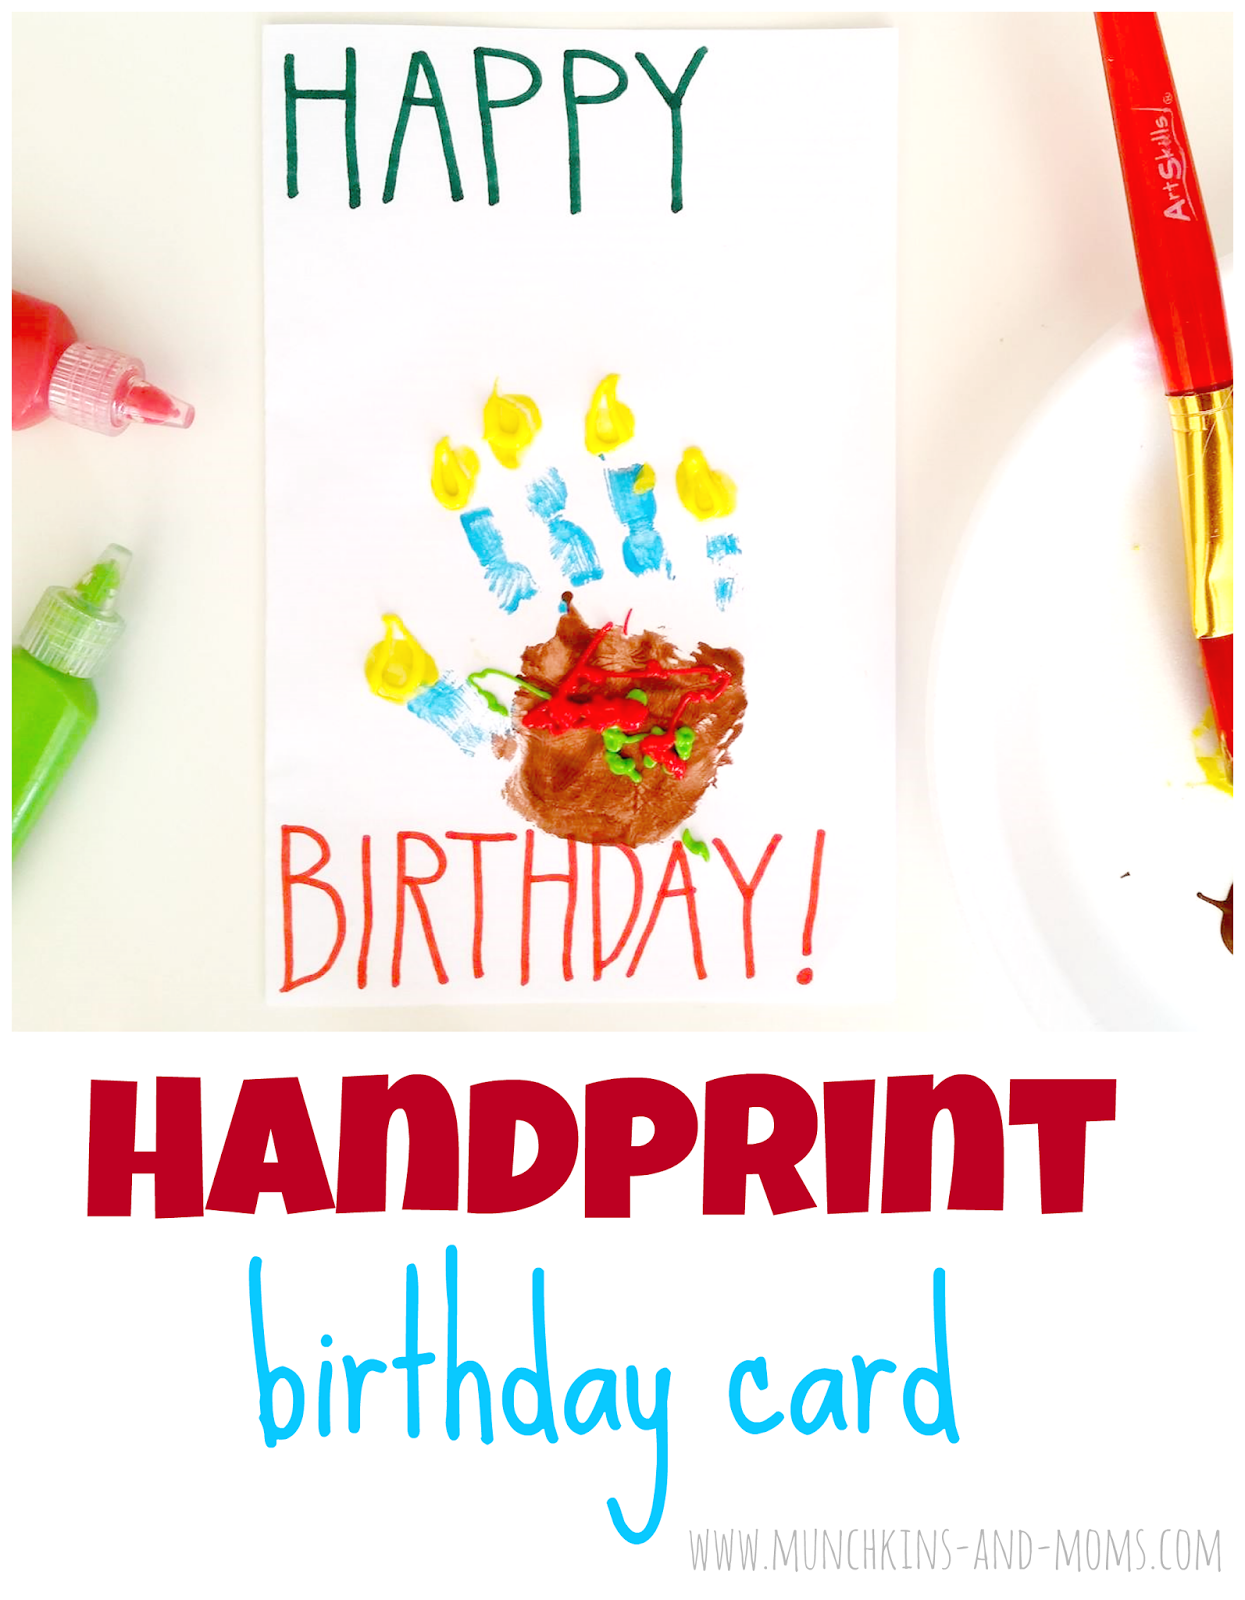 Handprint Birthday Cards Munchkins and Moms Birthday